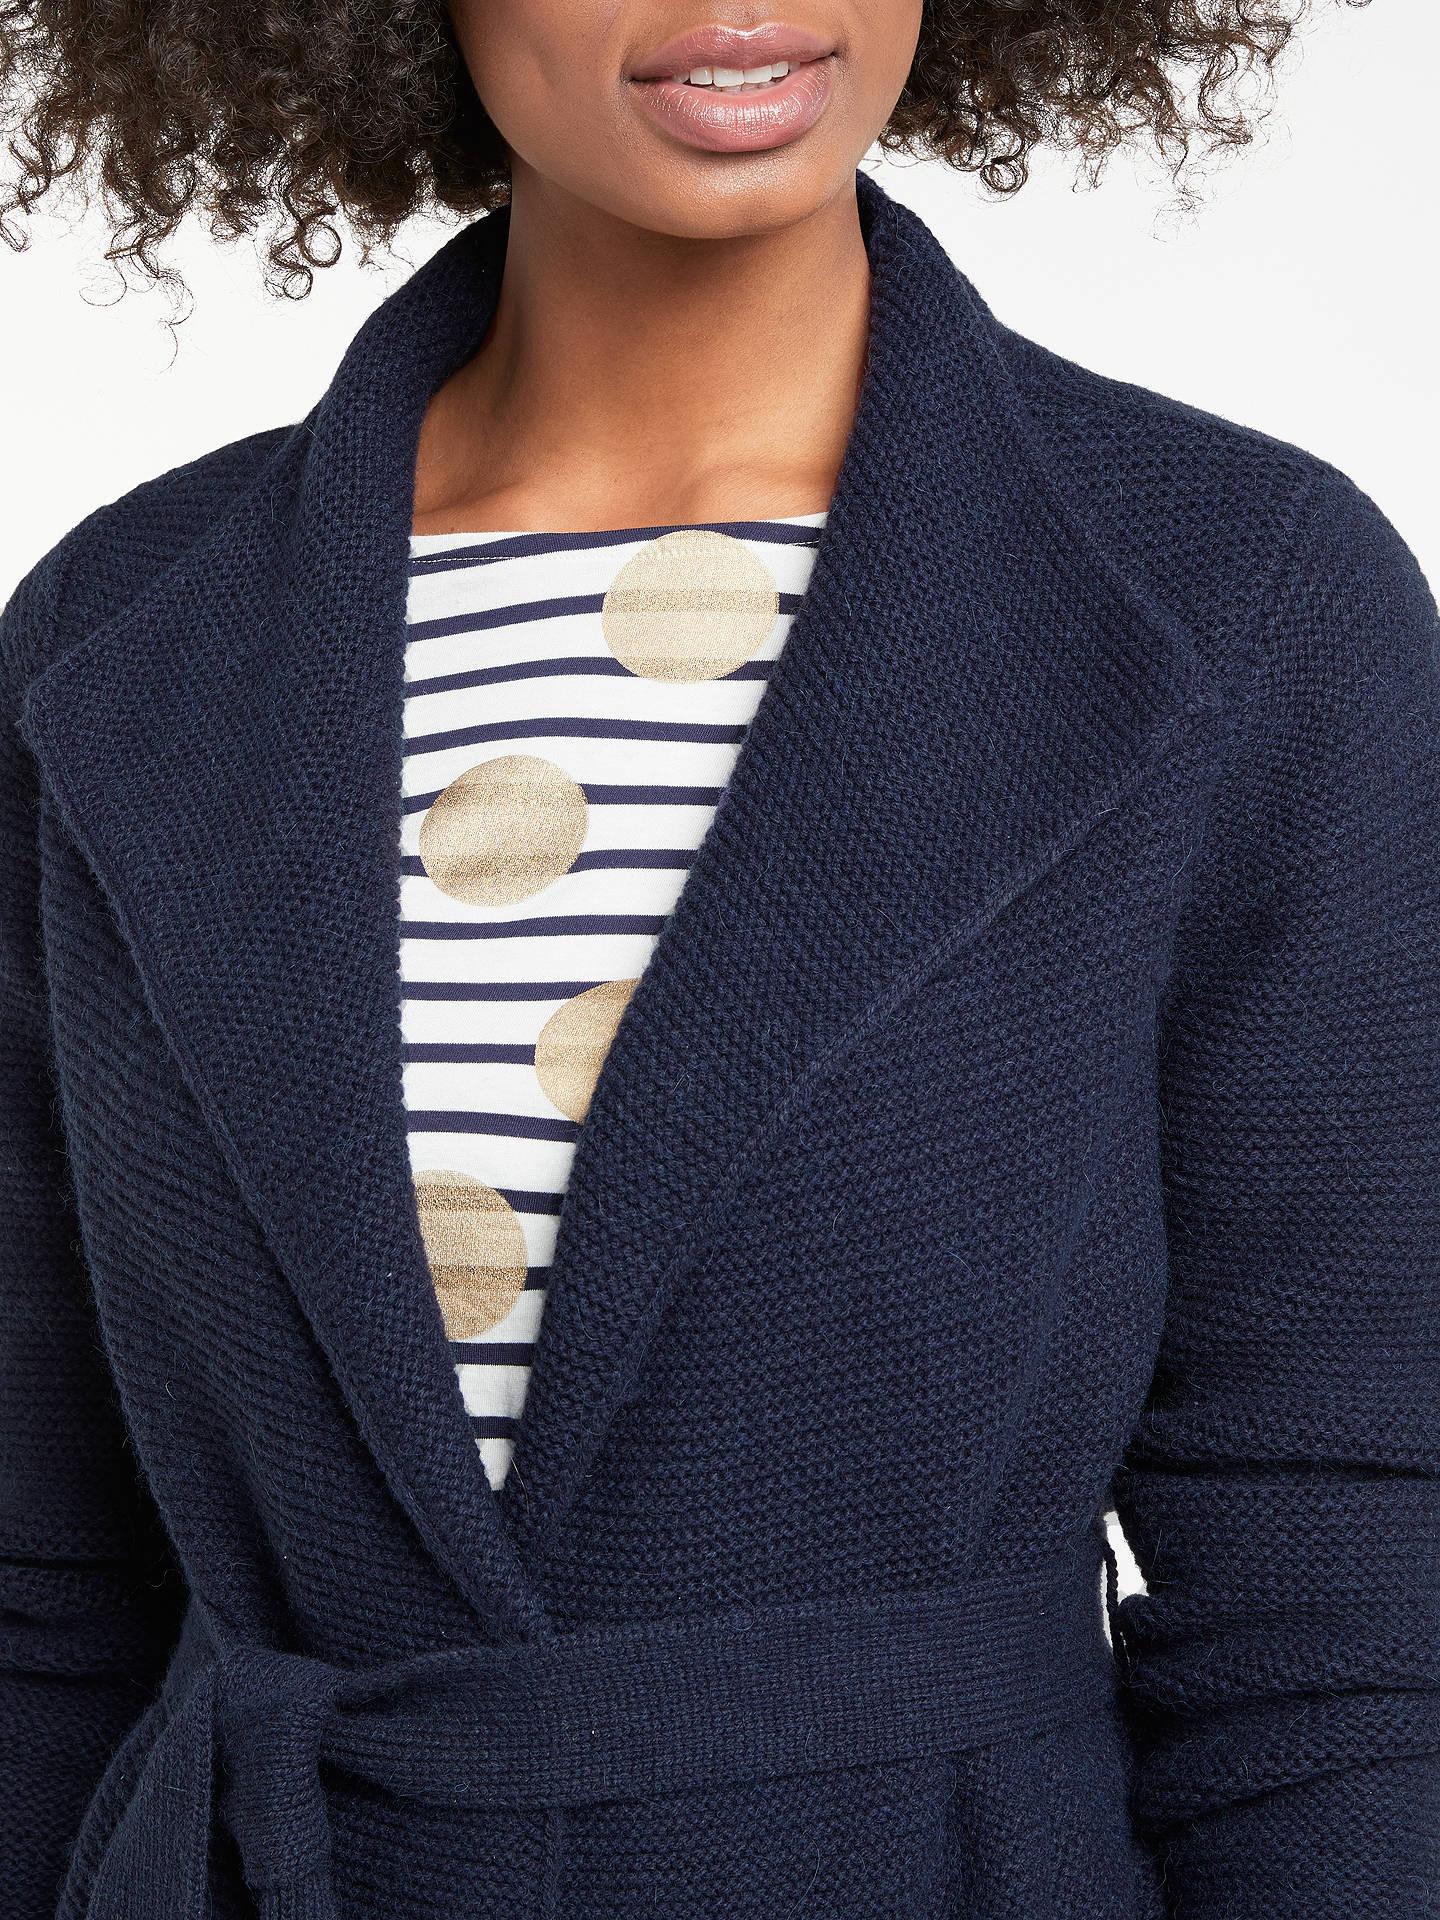 Boden Fiona Cardigan, Navy at John Lewis & Partners